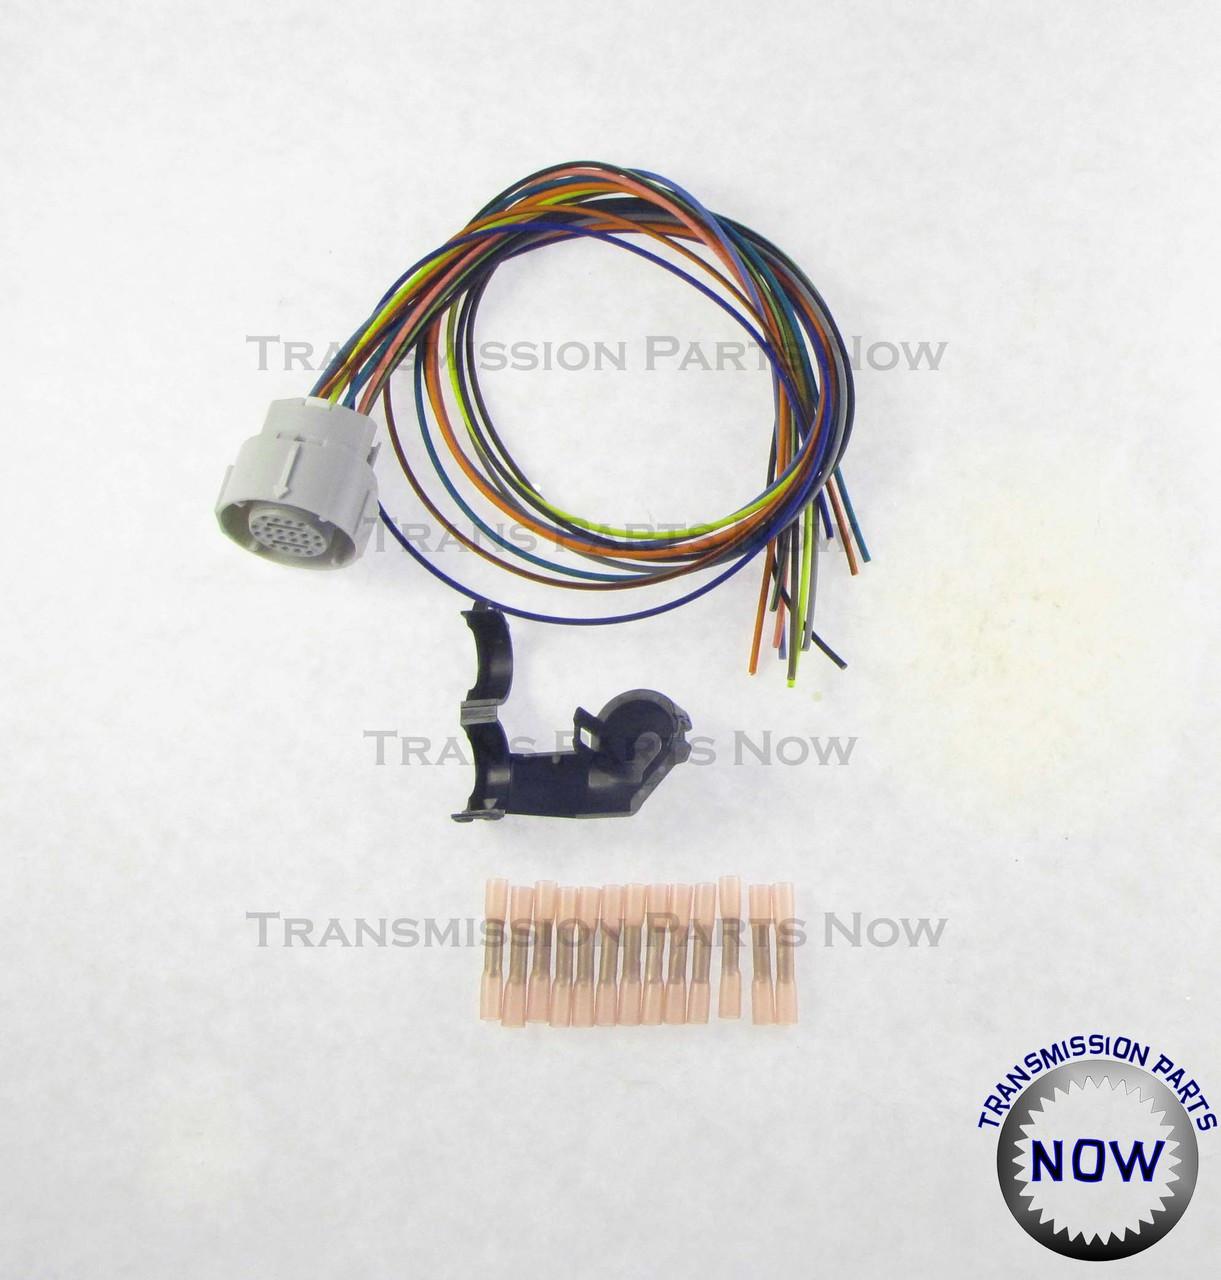 4l80e wiring harness 4l80e external wiring harness update kit  34445ek 4l80e wiring harness failure 4l80e external wiring harness update